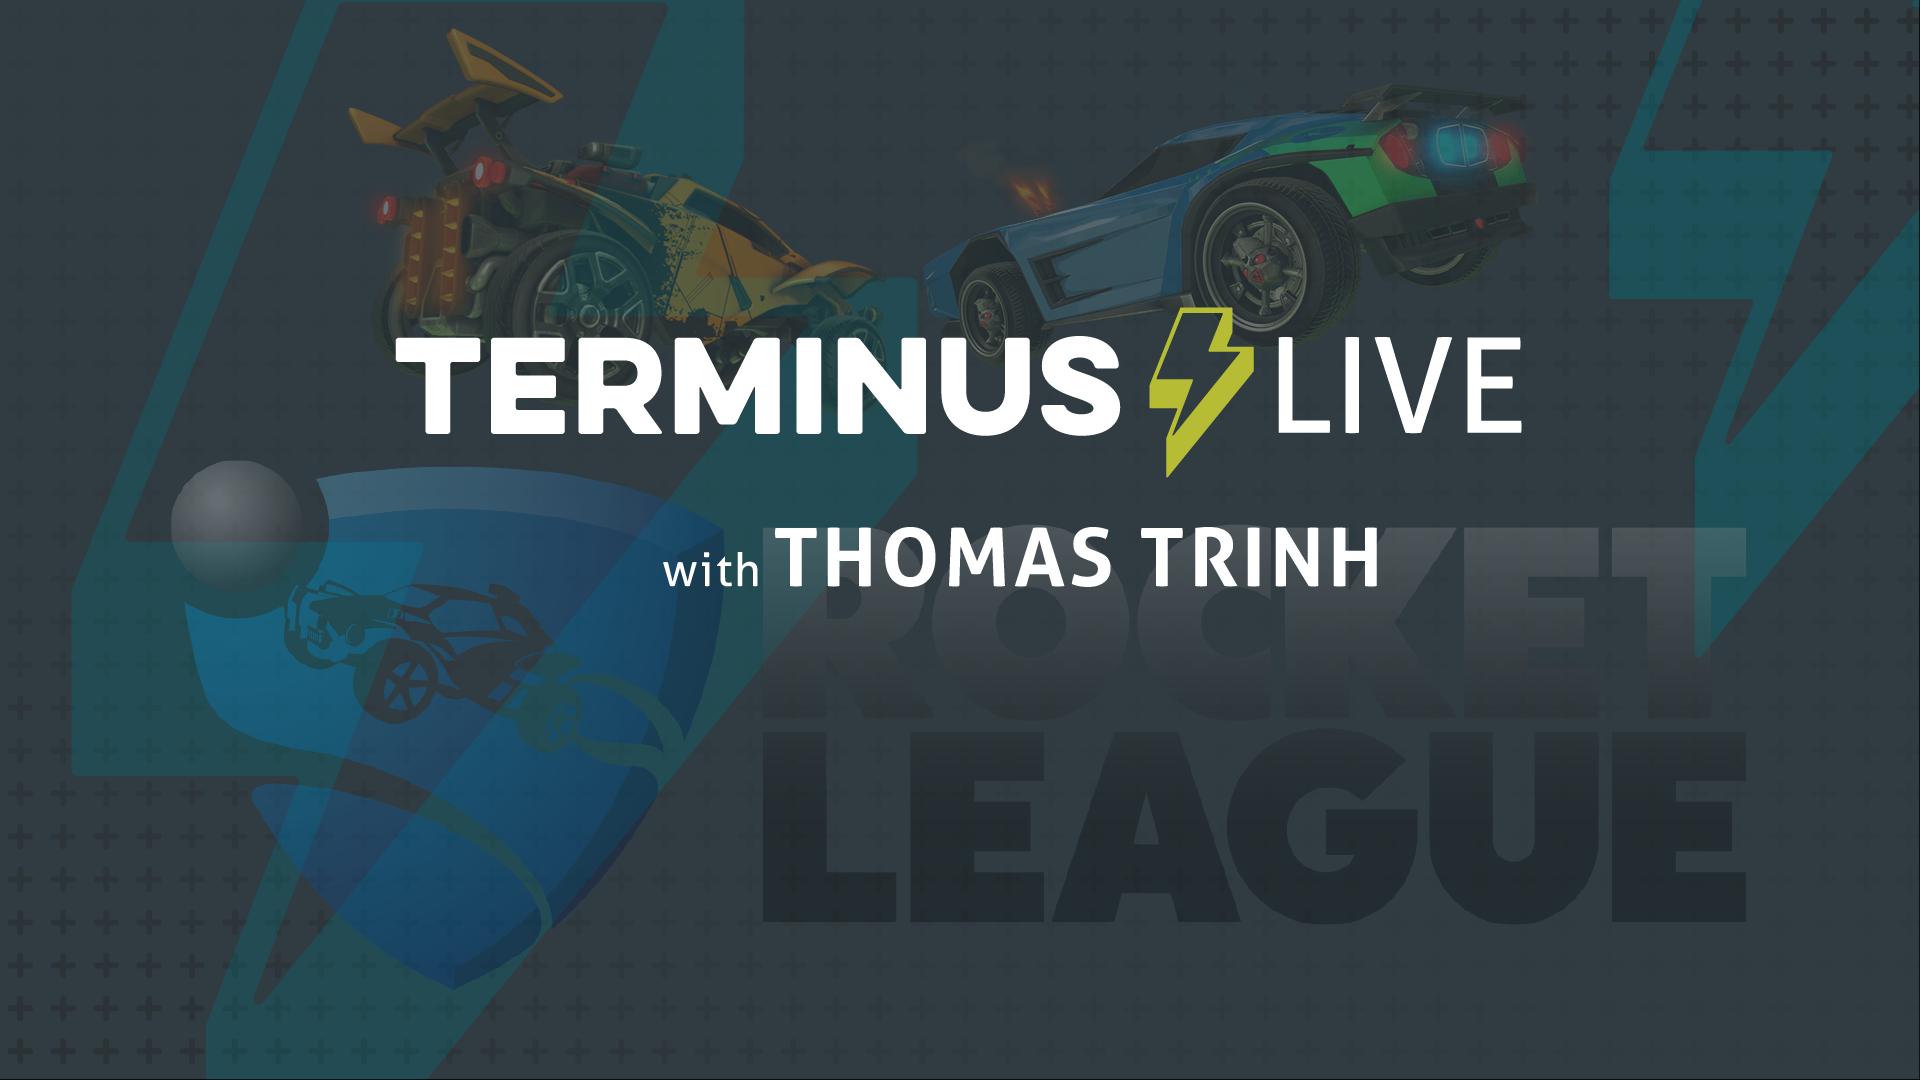 TERMINUS Live: Thomas Trinh plays Rocket League